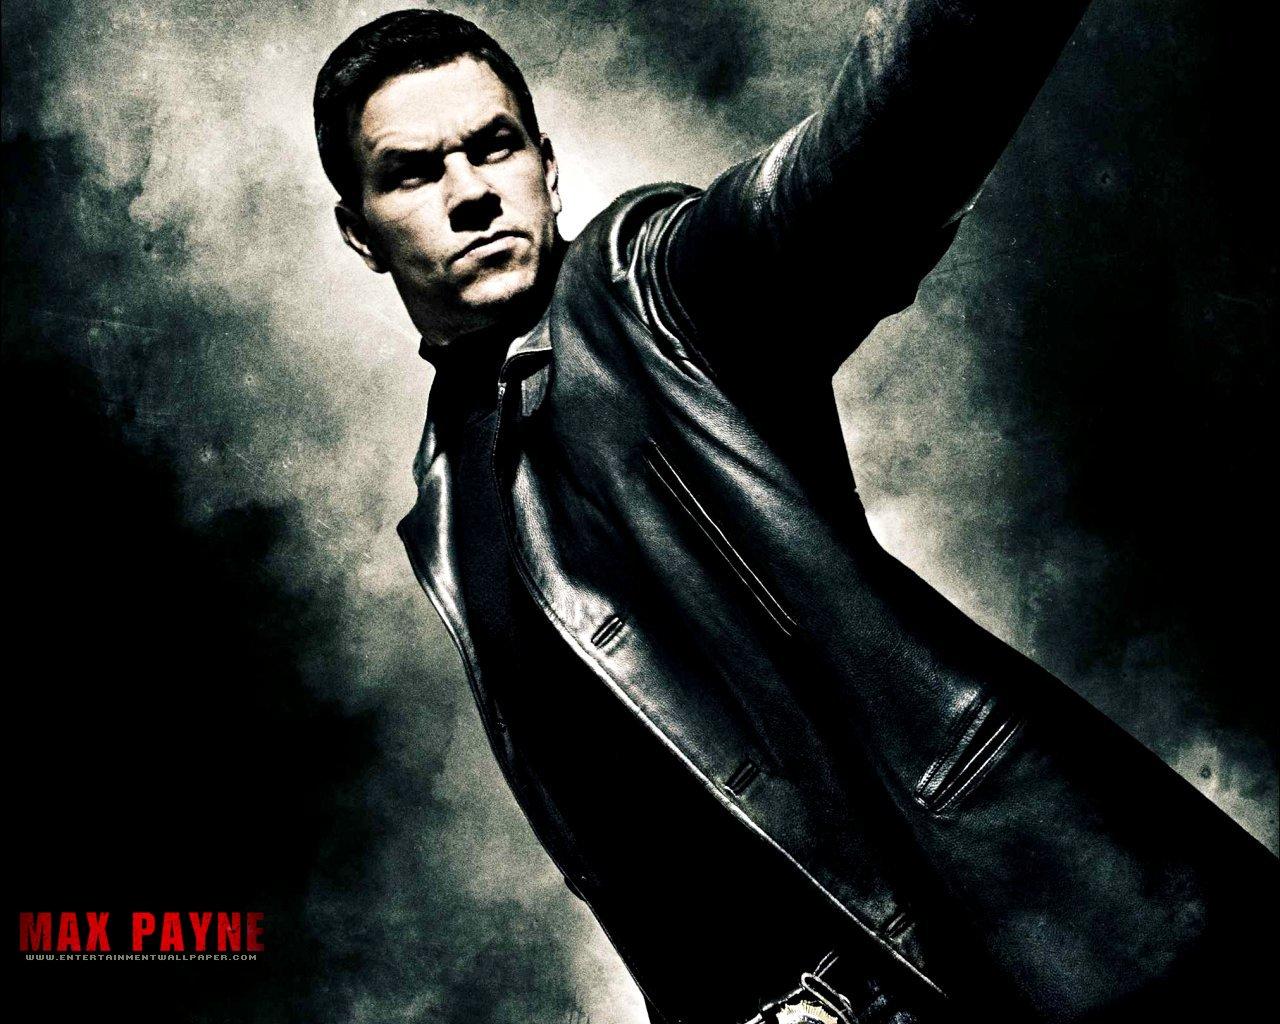 Max Payne Wallpaper 1280x1024